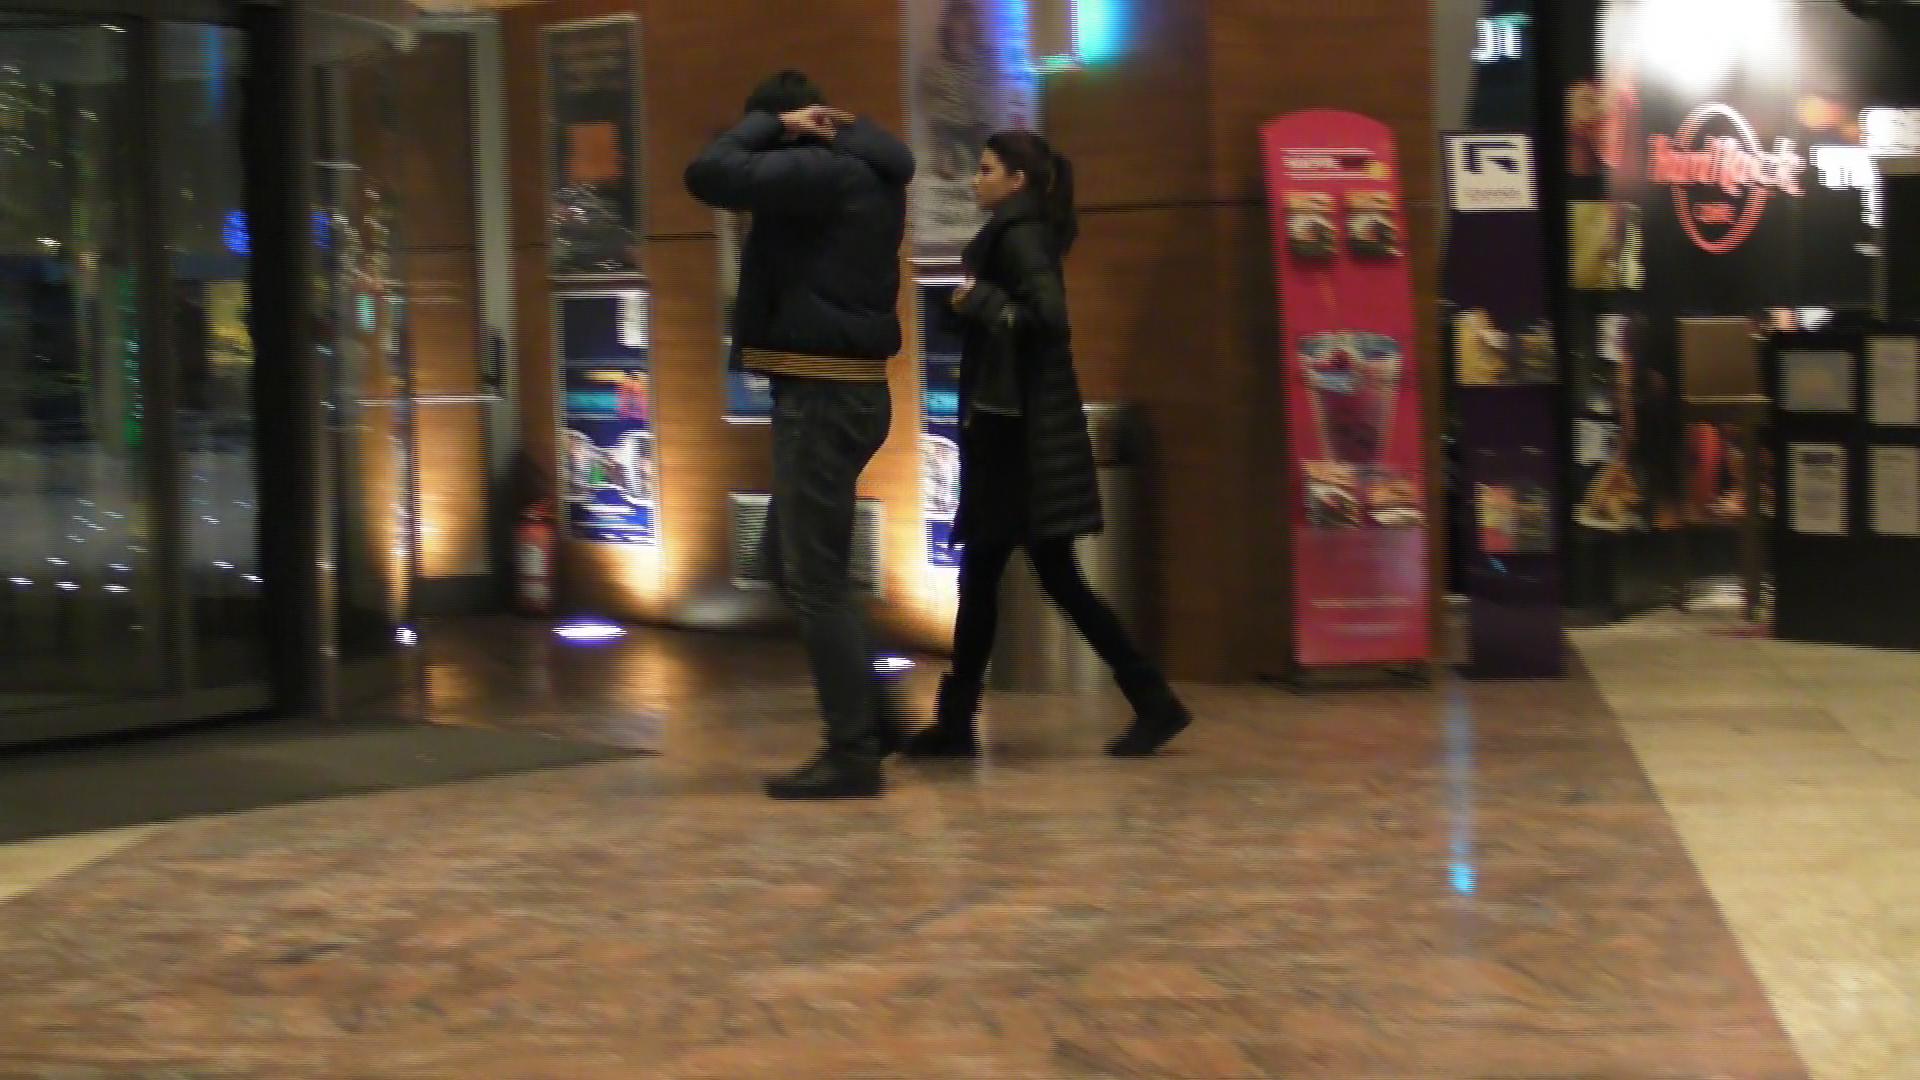 Inainte de a parasi mall-ul fiecare dintre ei se incheie la haina